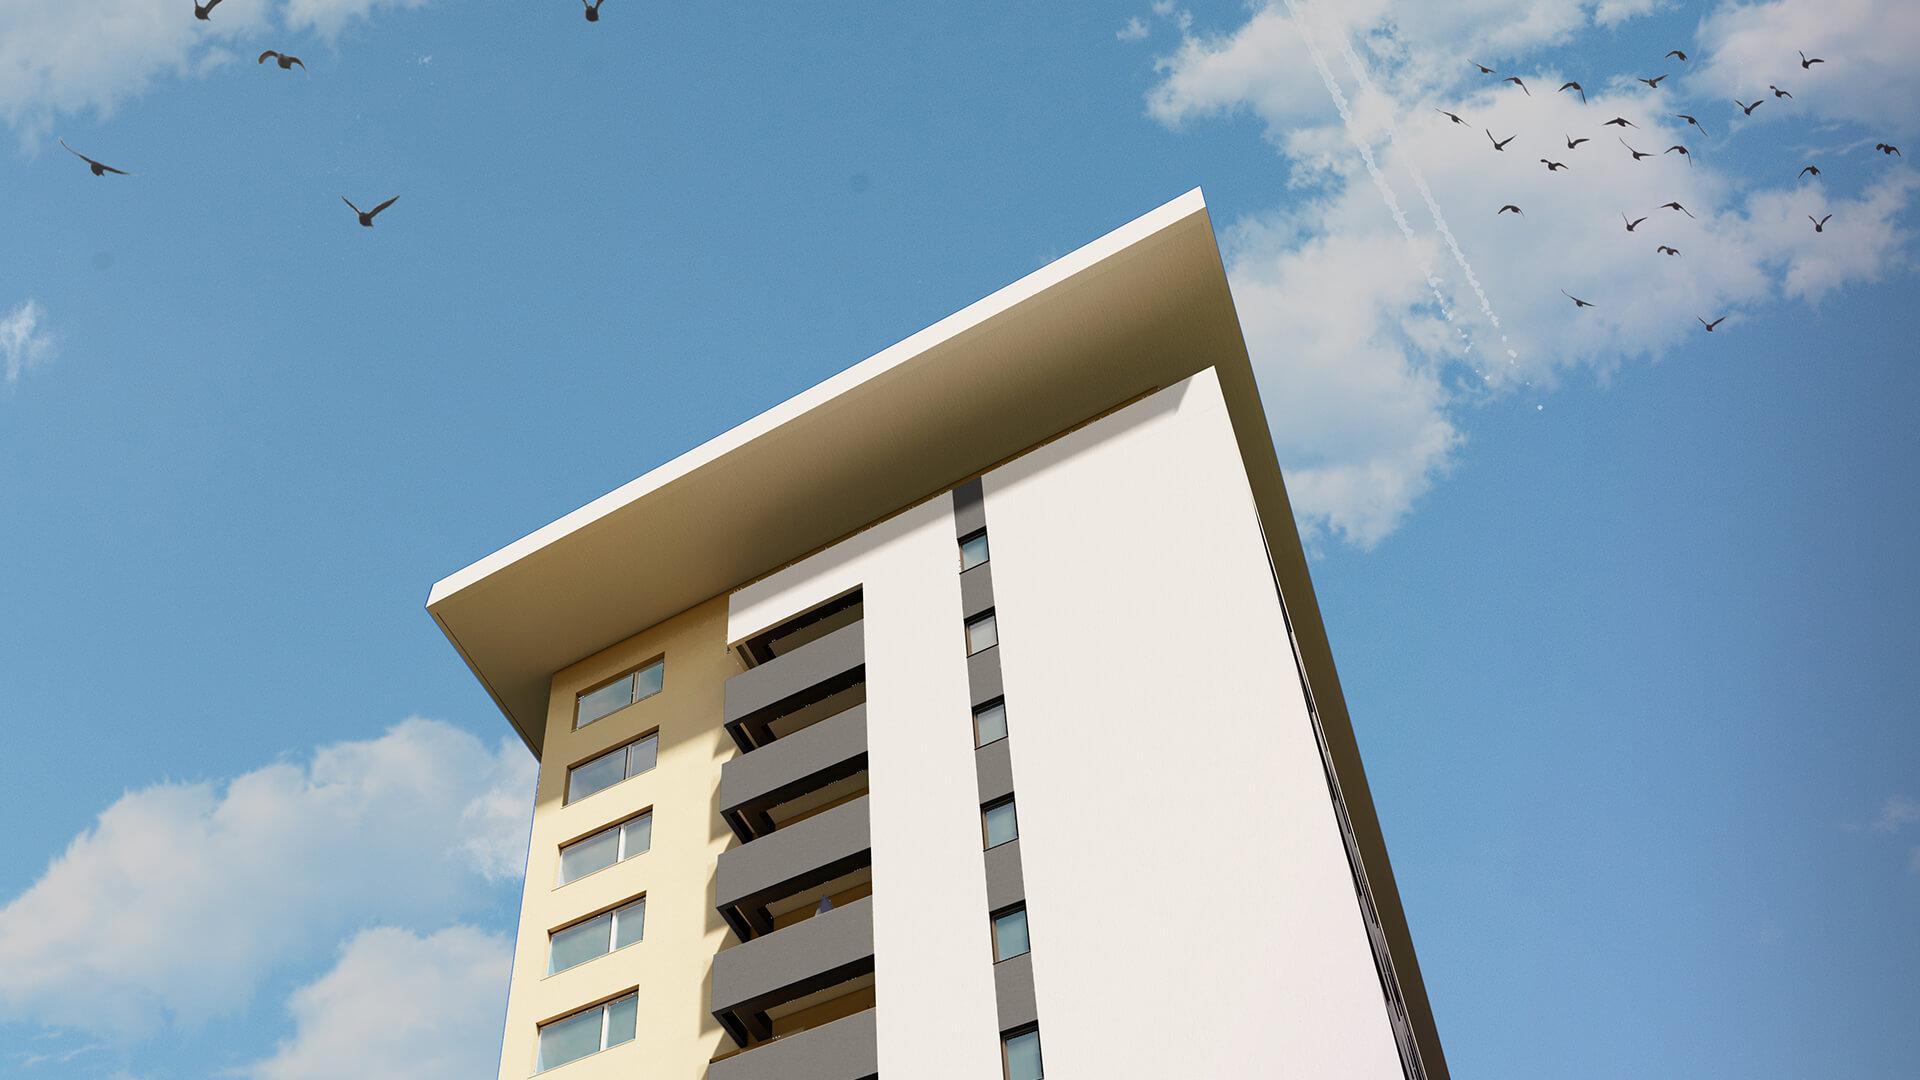 apartamente_noi_iasi_galata-nicolina_dezvoltator_cu_experienta_04